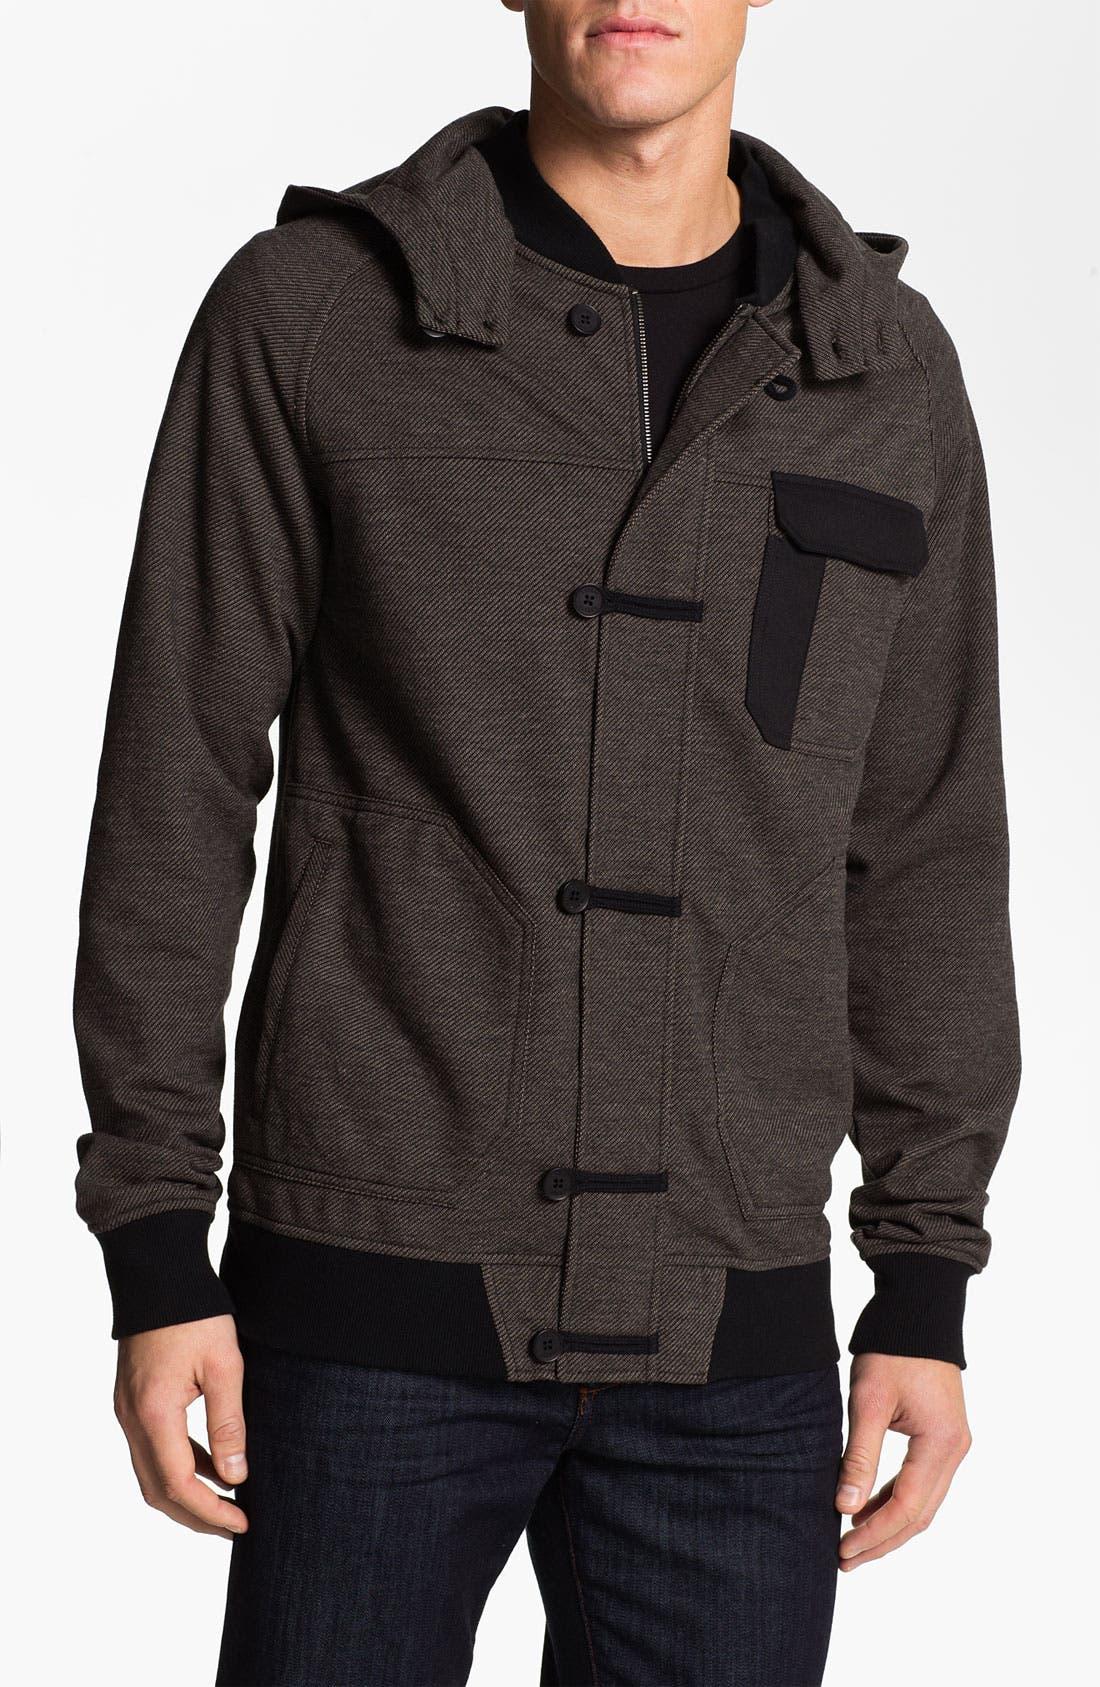 Alternate Image 1 Selected - Ezekiel 'Jaxson' Sweatshirt Jacket